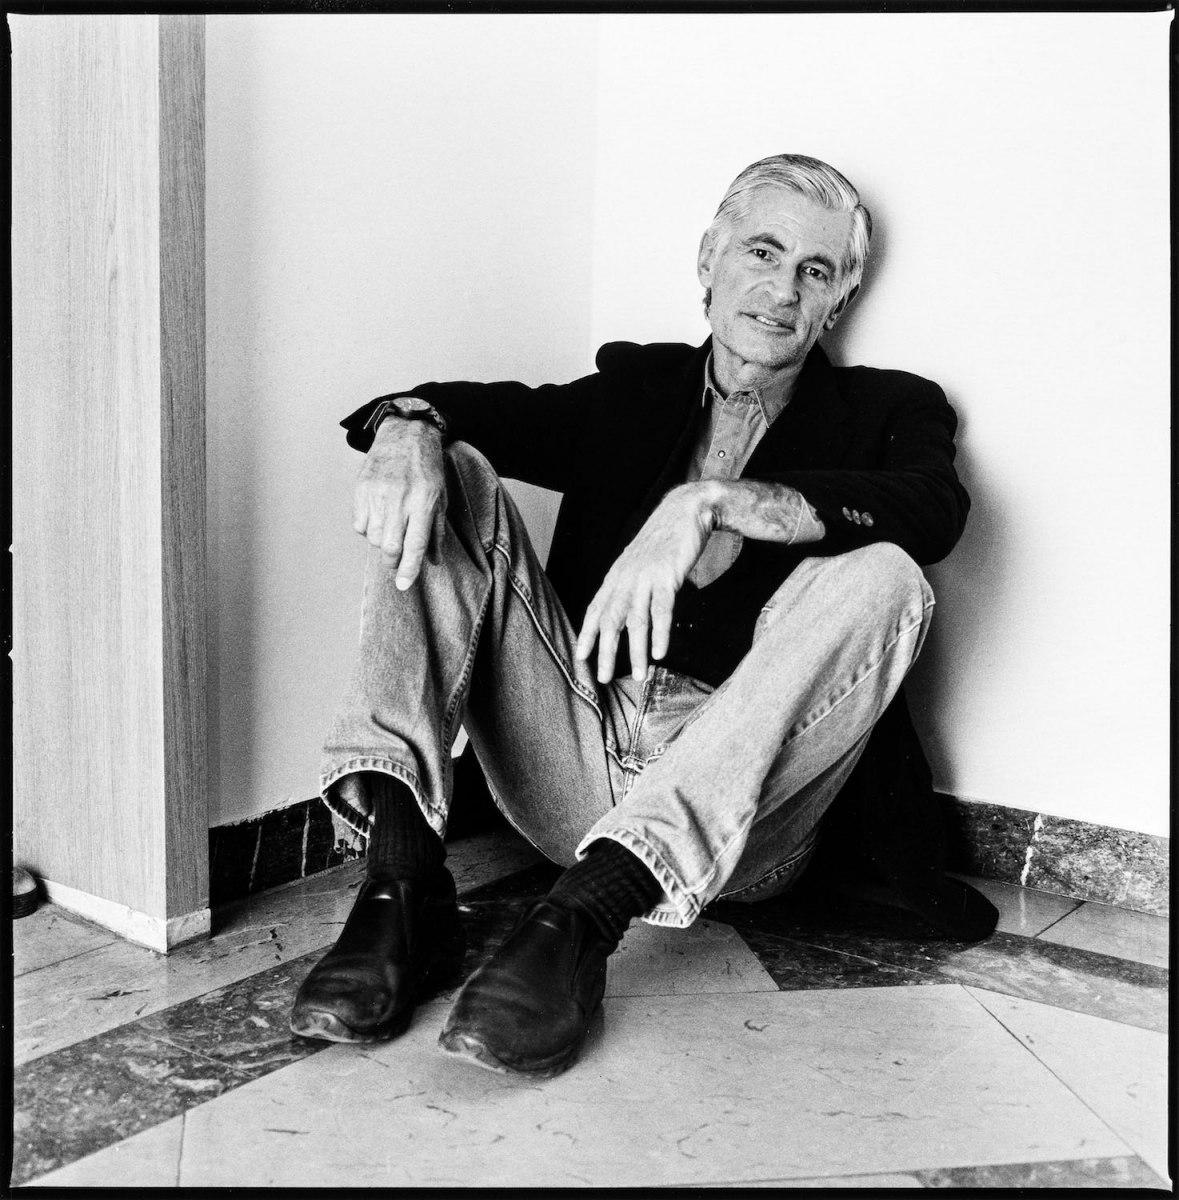 James Nachtwey, Berlin 2006